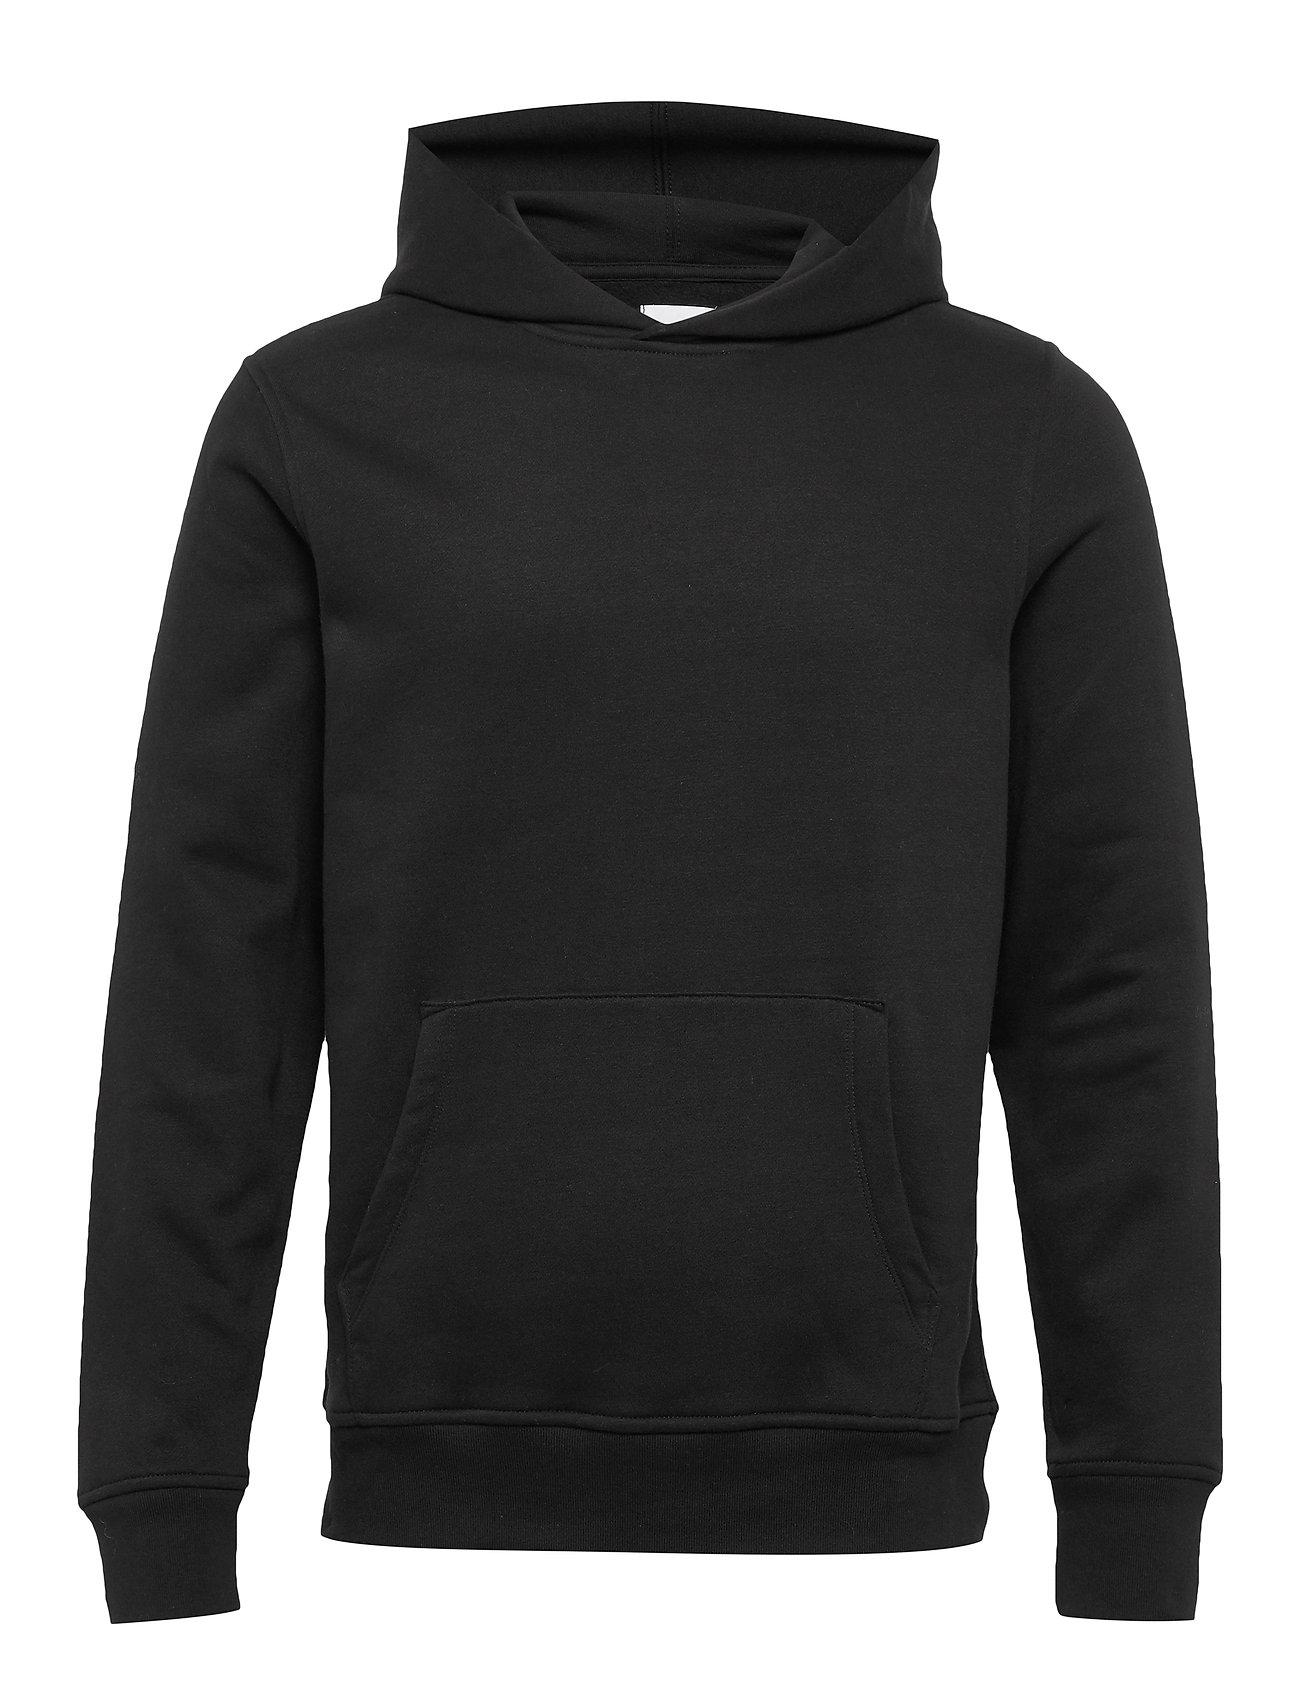 GAP Vintage Soft Pullover Hoodie - TRUE BLACK V2 2